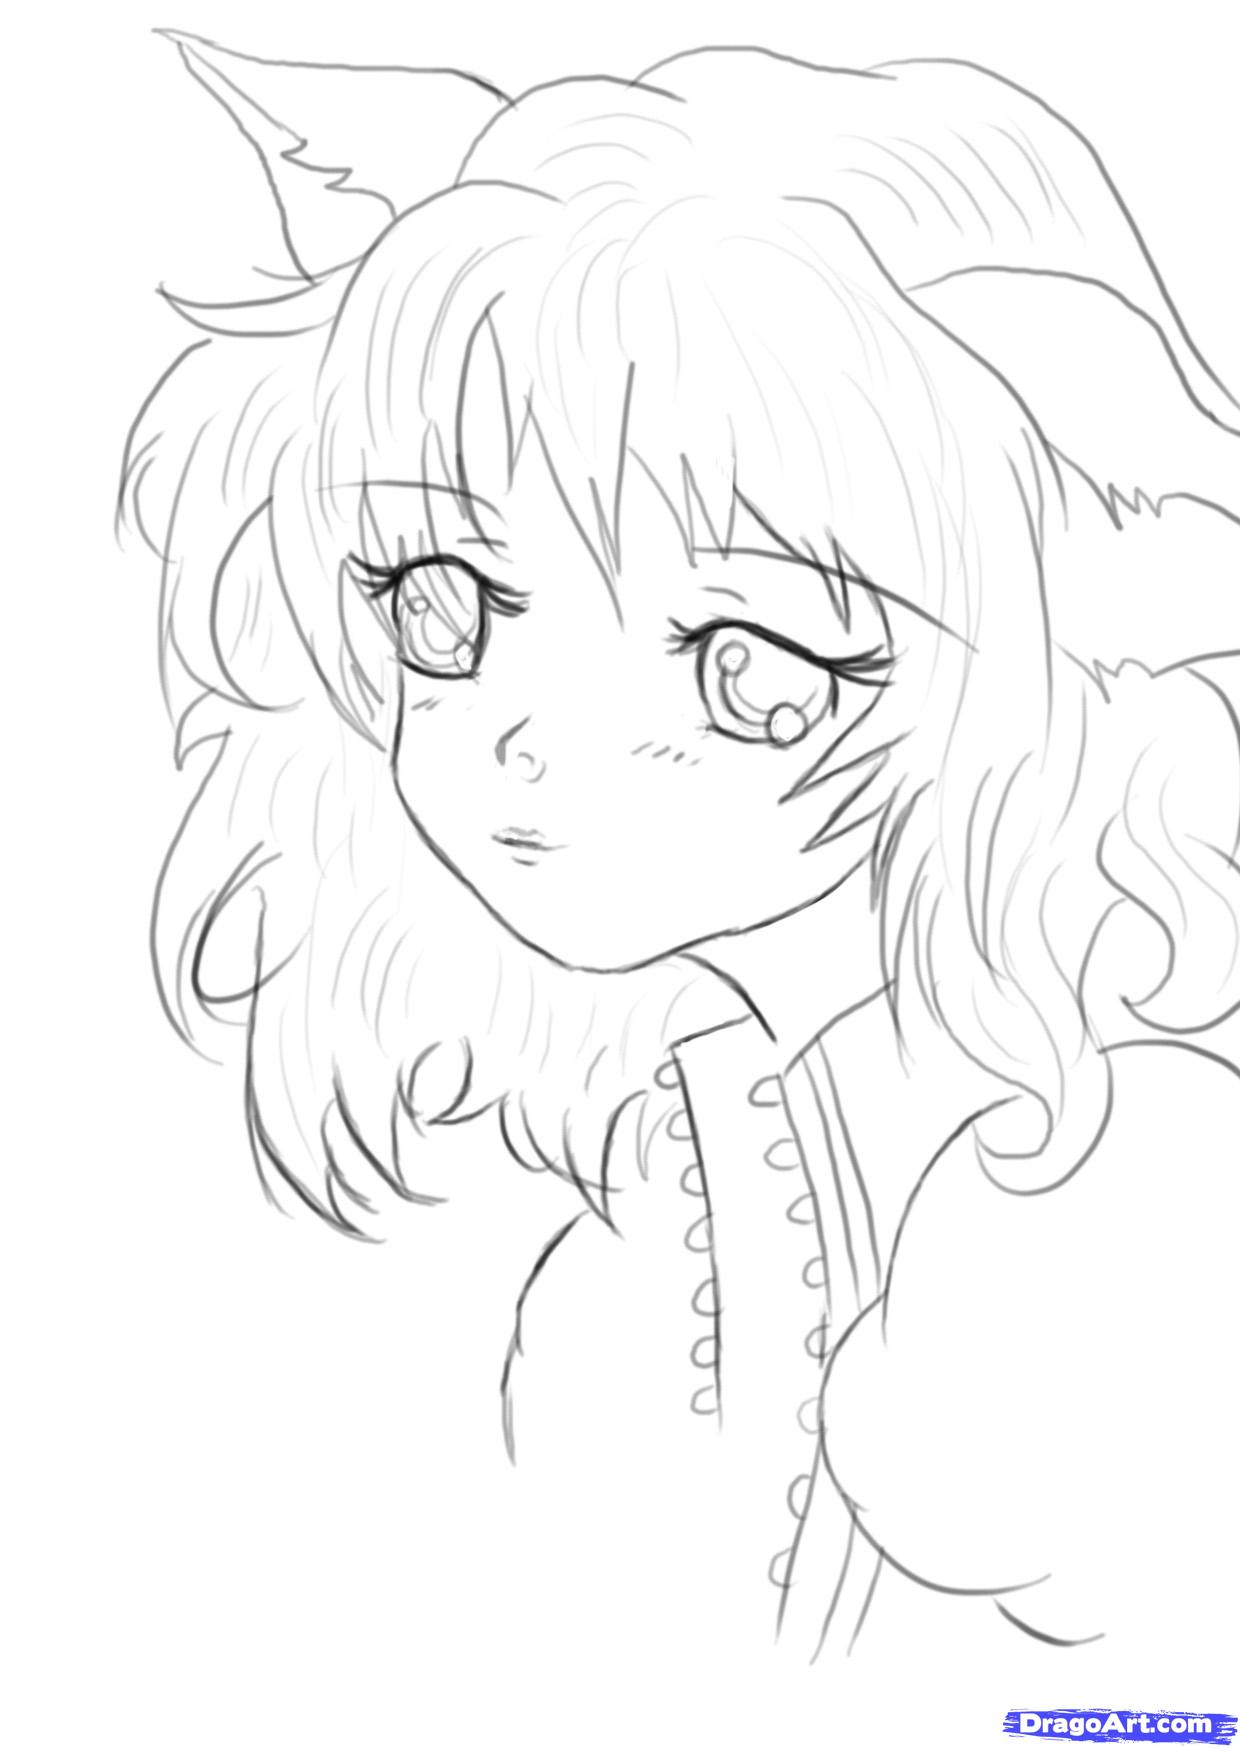 1240x1748 Easy Cute Anime Drawings Tag Easy Cute Anime Couple Drawings